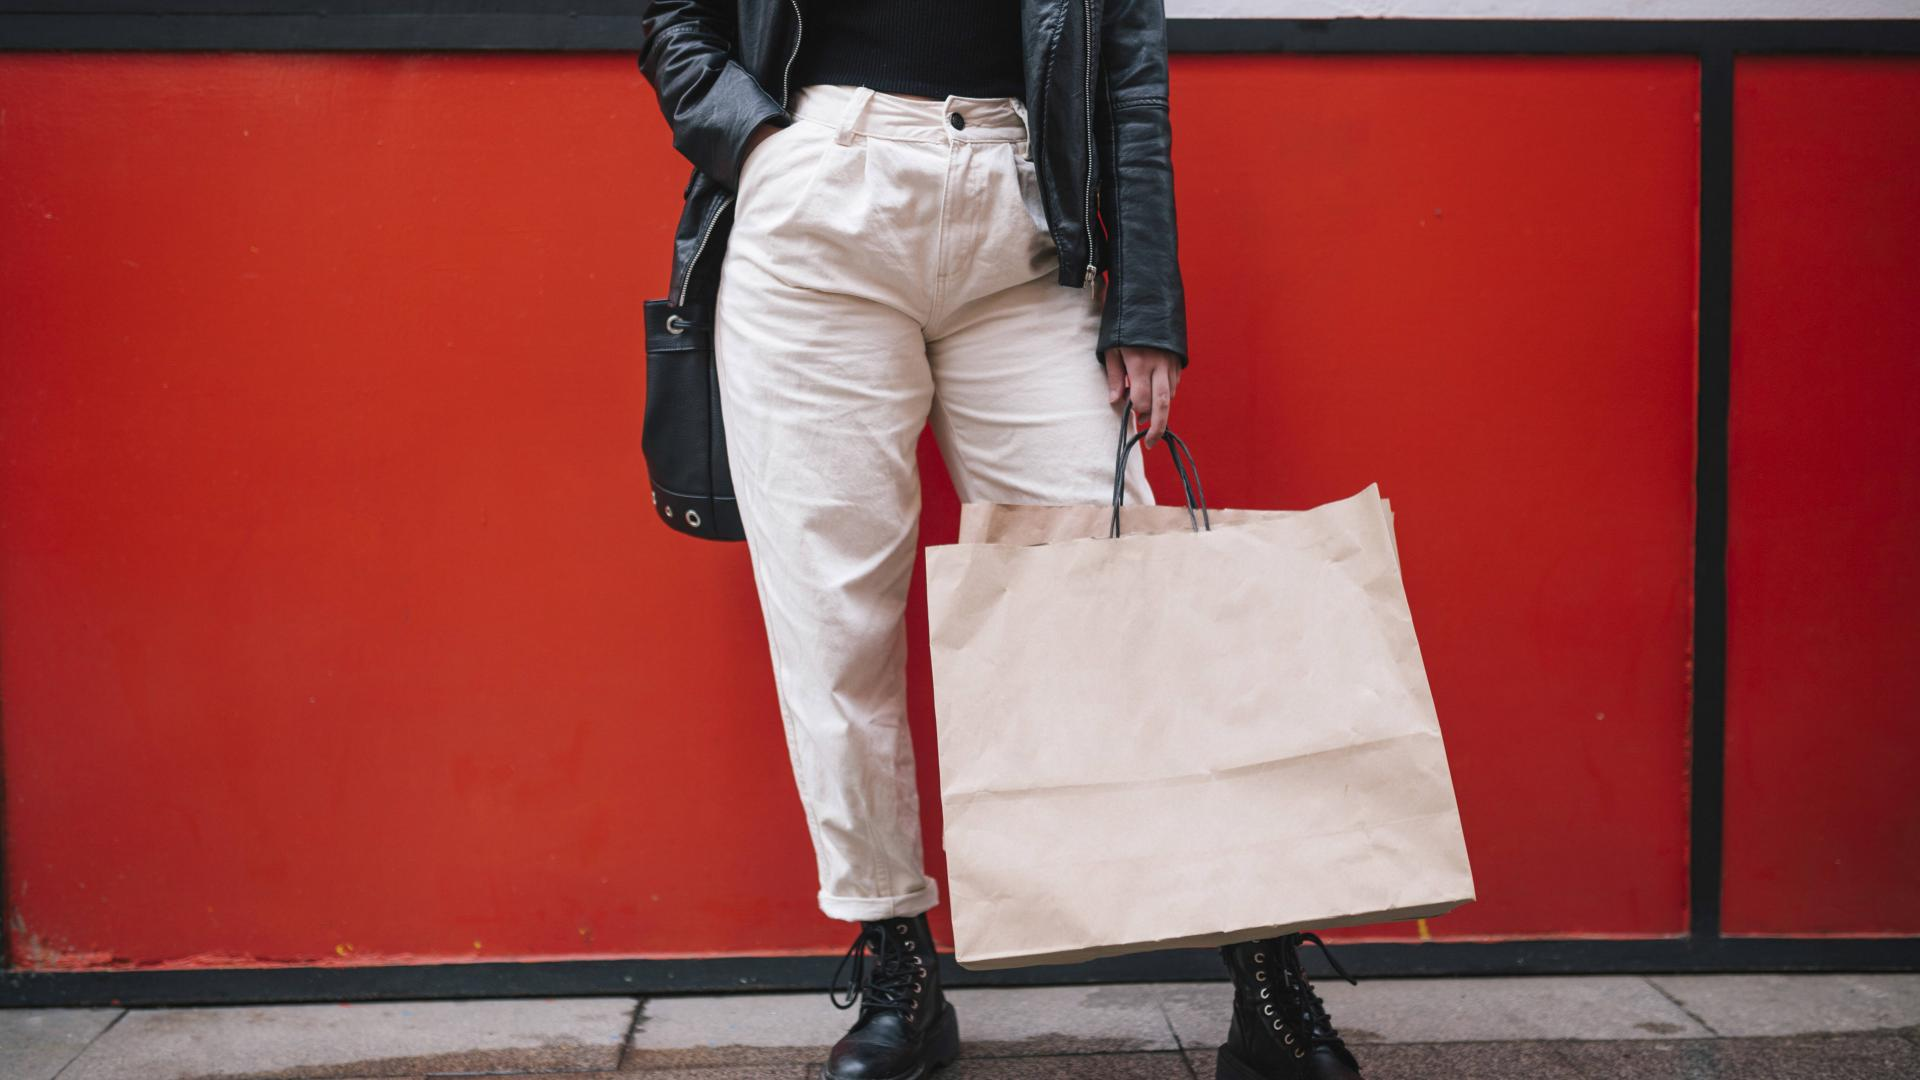 Frau Shoppingbag